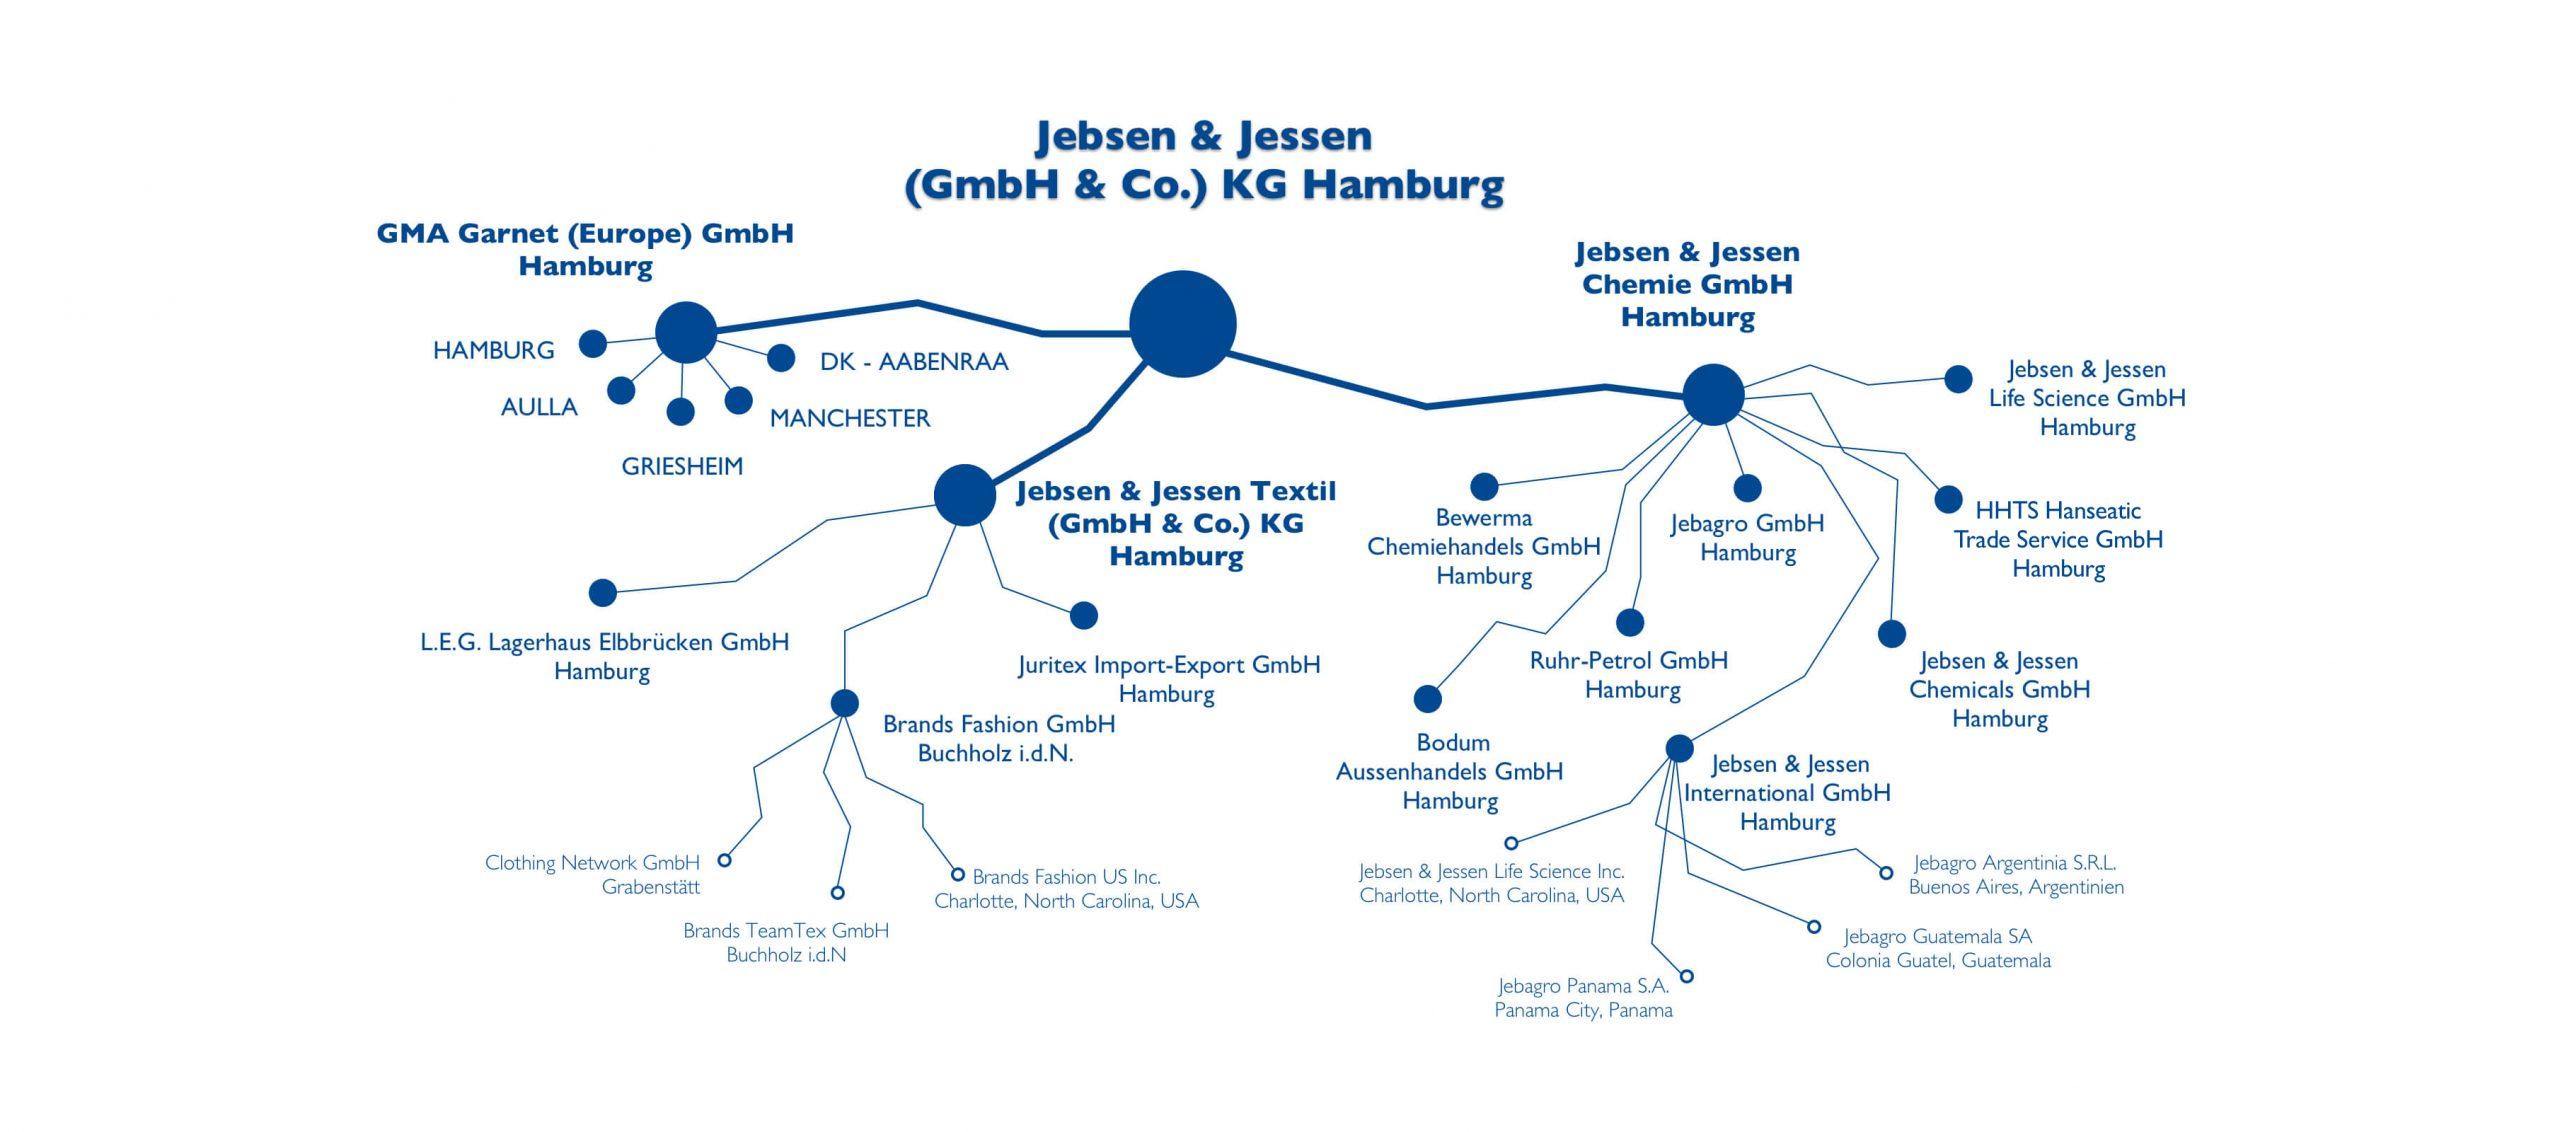 Chemical trade company Jebsen & Jessen, Organigram Desktop